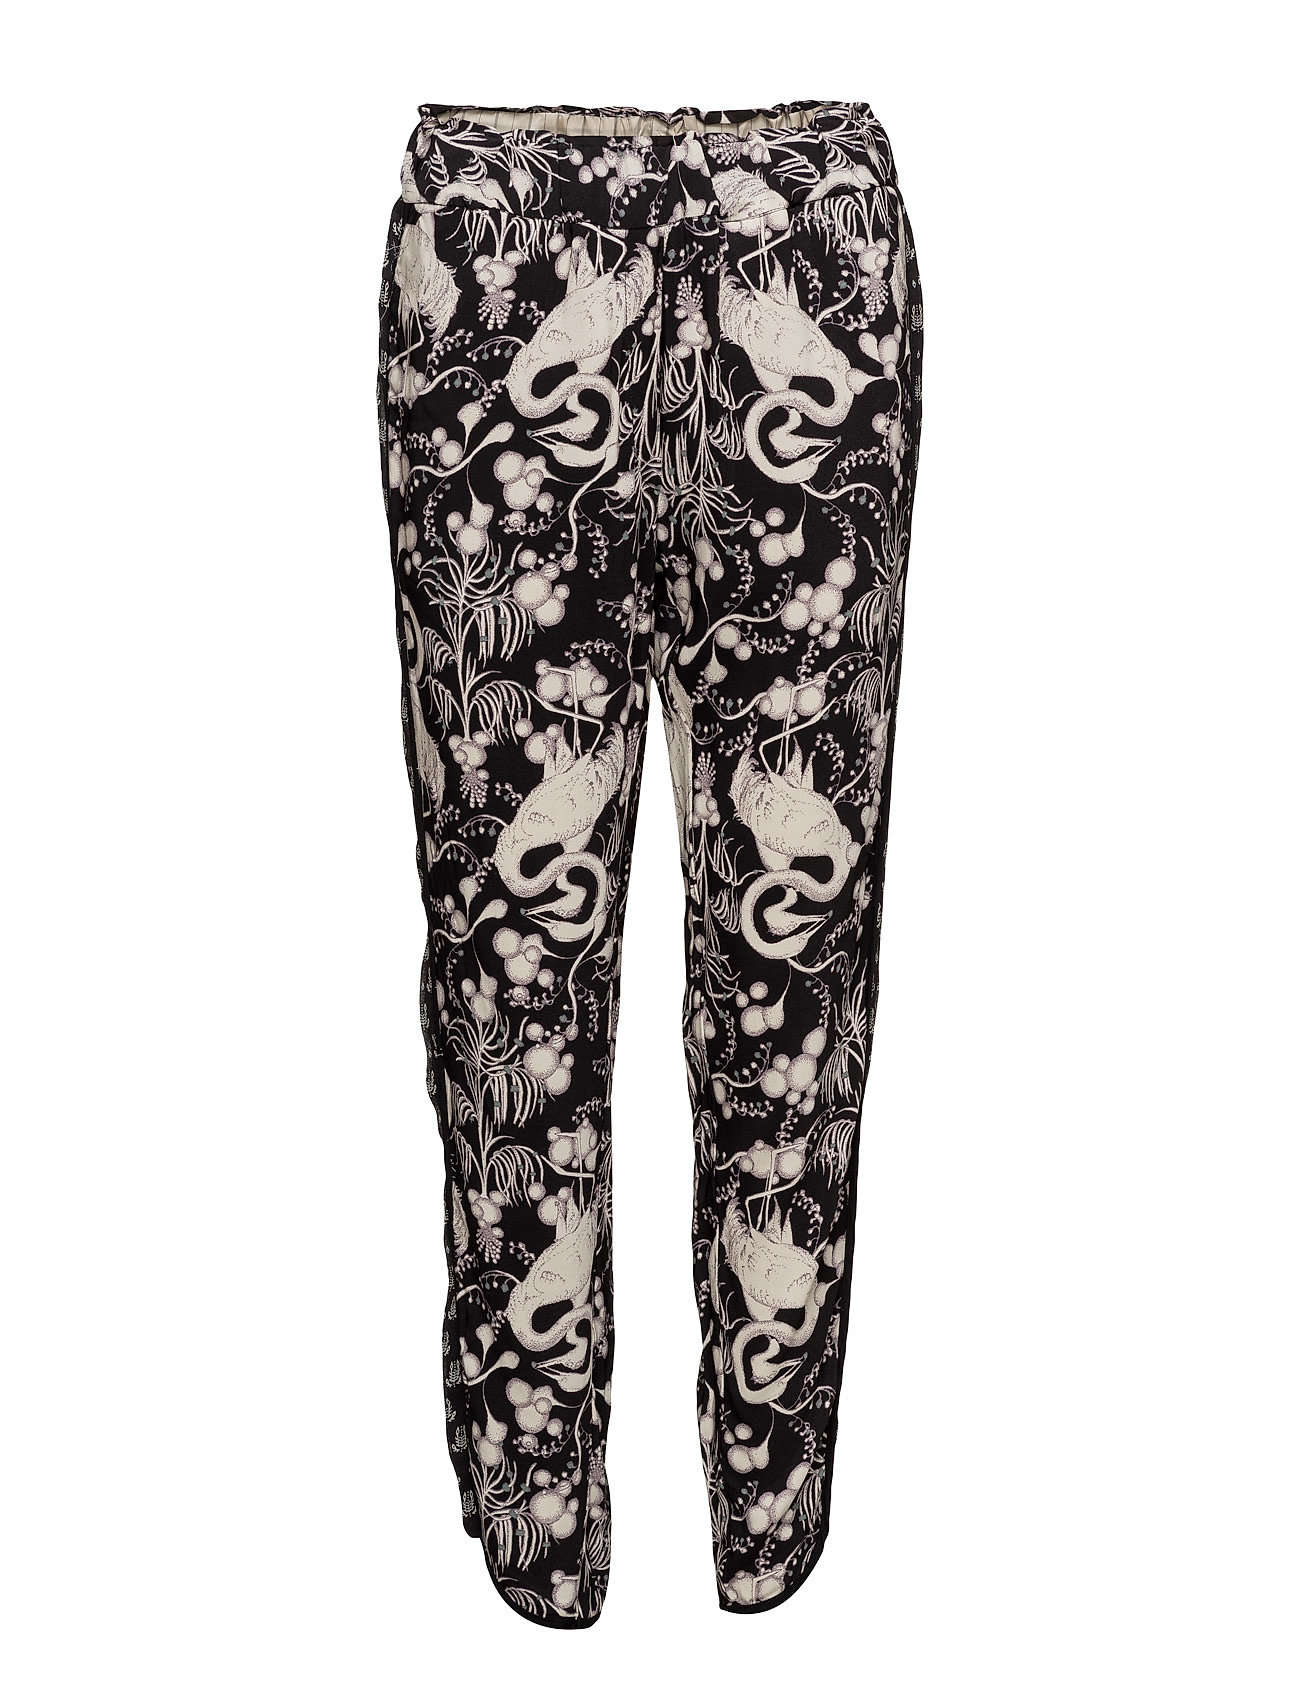 Trousers Noa Noa Casual bukser til Damer i Print Black